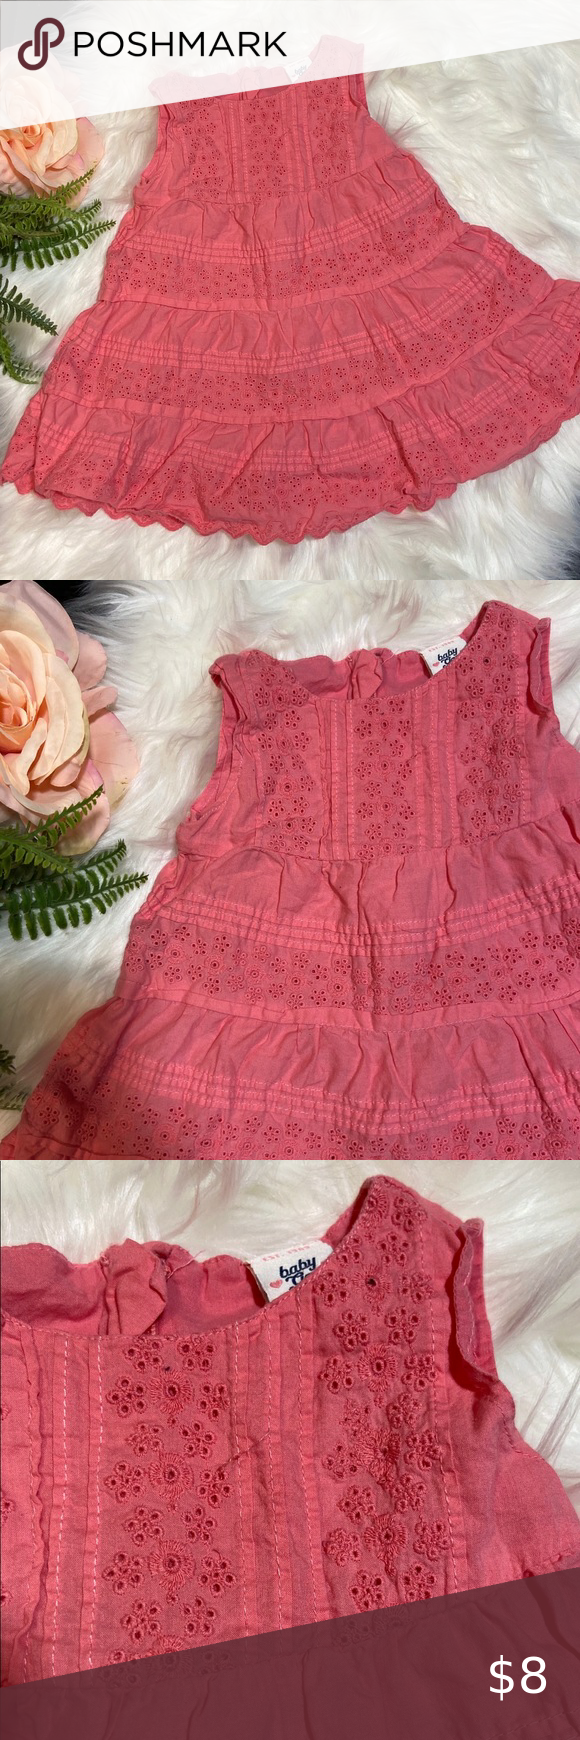 Baby Gap Peach Eyelet Summer Dress Size 18 24m Summer Dresses Size 18 Dress Gap Dress [ 1740 x 580 Pixel ]